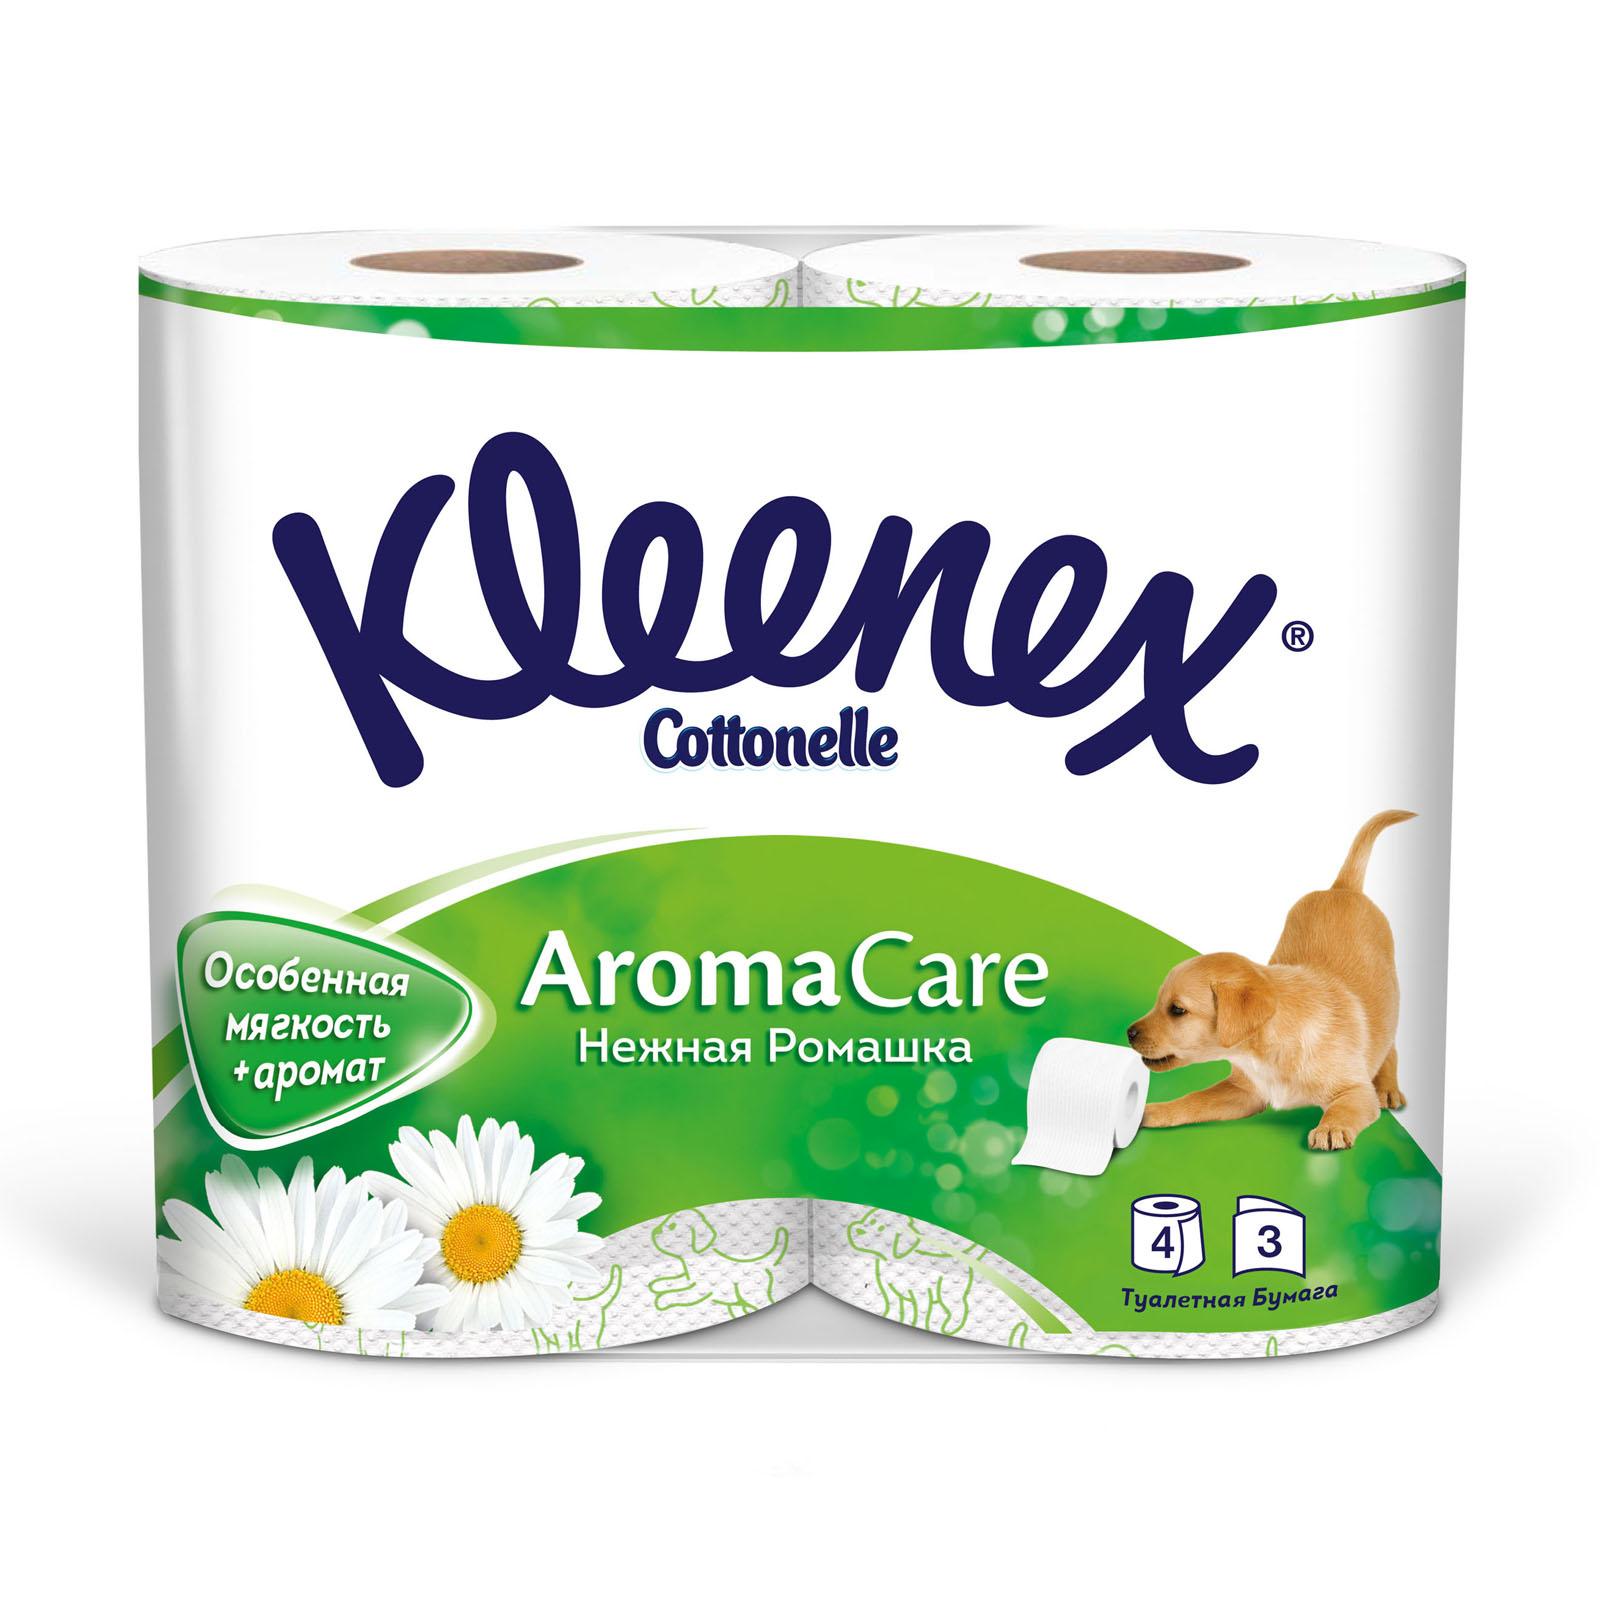 Туалетная бумага Kleenex ромашка (3 слоя) 4 шт<br>